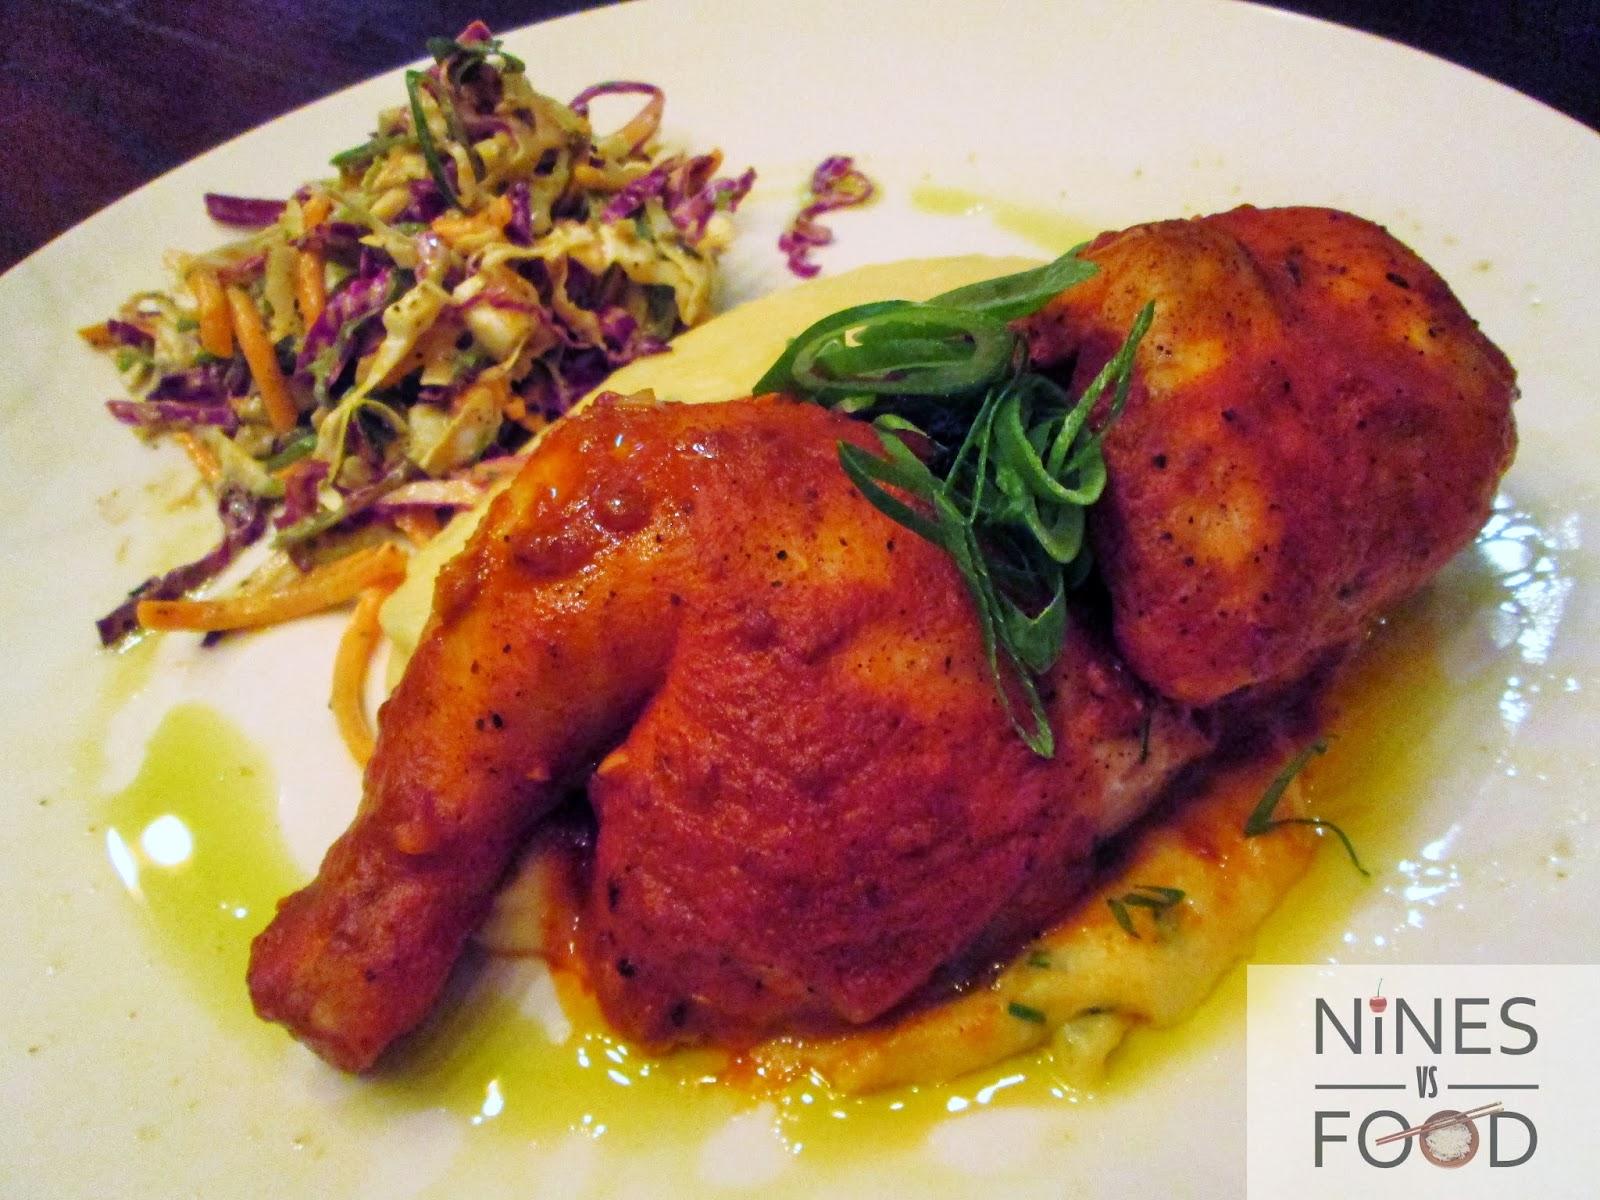 Nines vs. Food - Olive Tree Kitchen and Bar-21.jpg